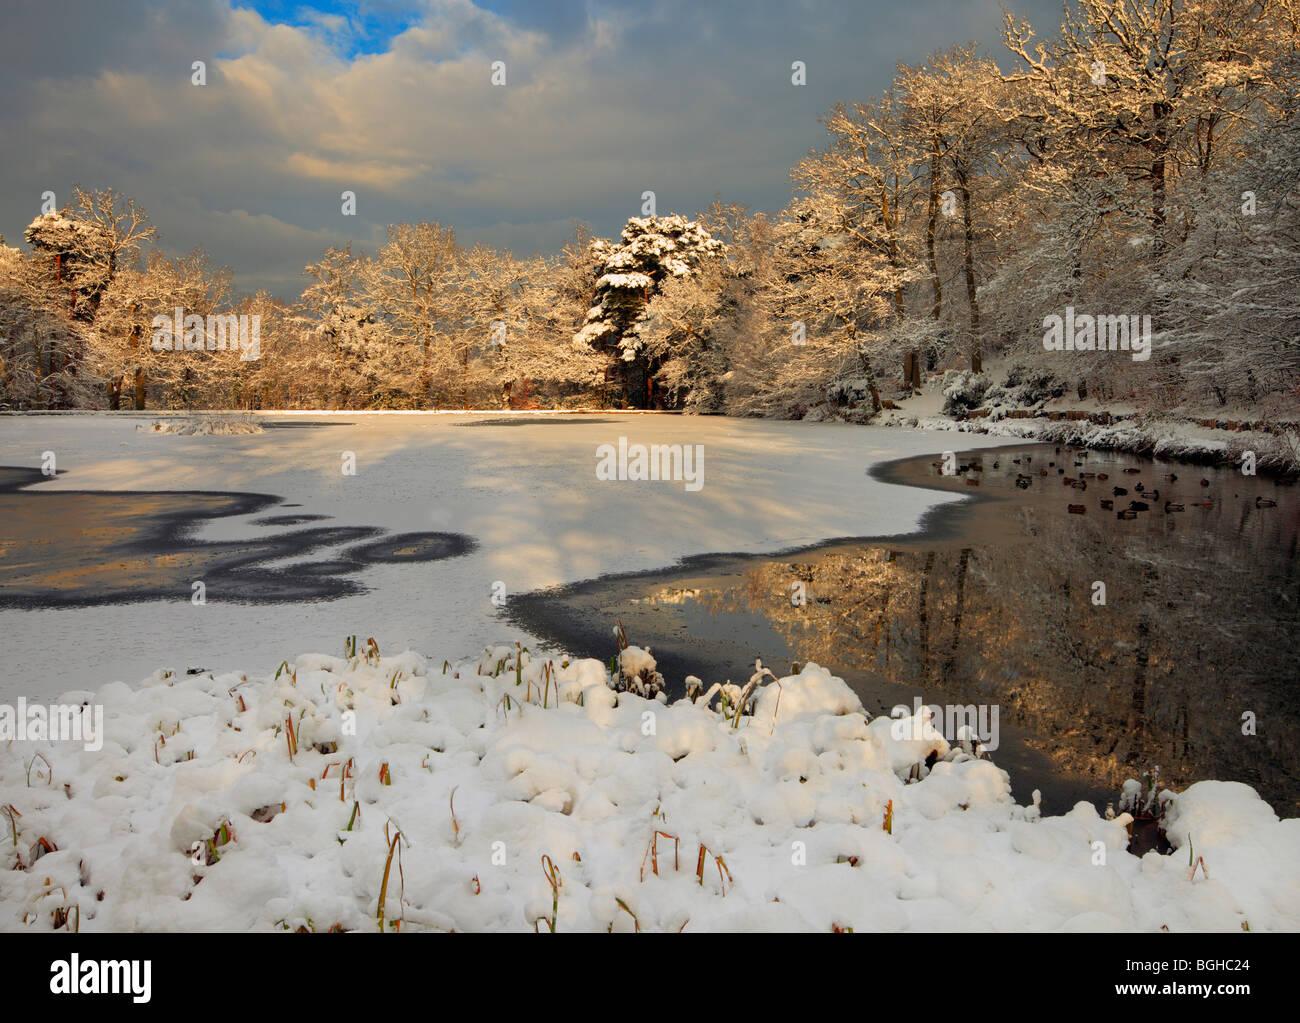 Les étangs Keston winter scene. Photo Stock